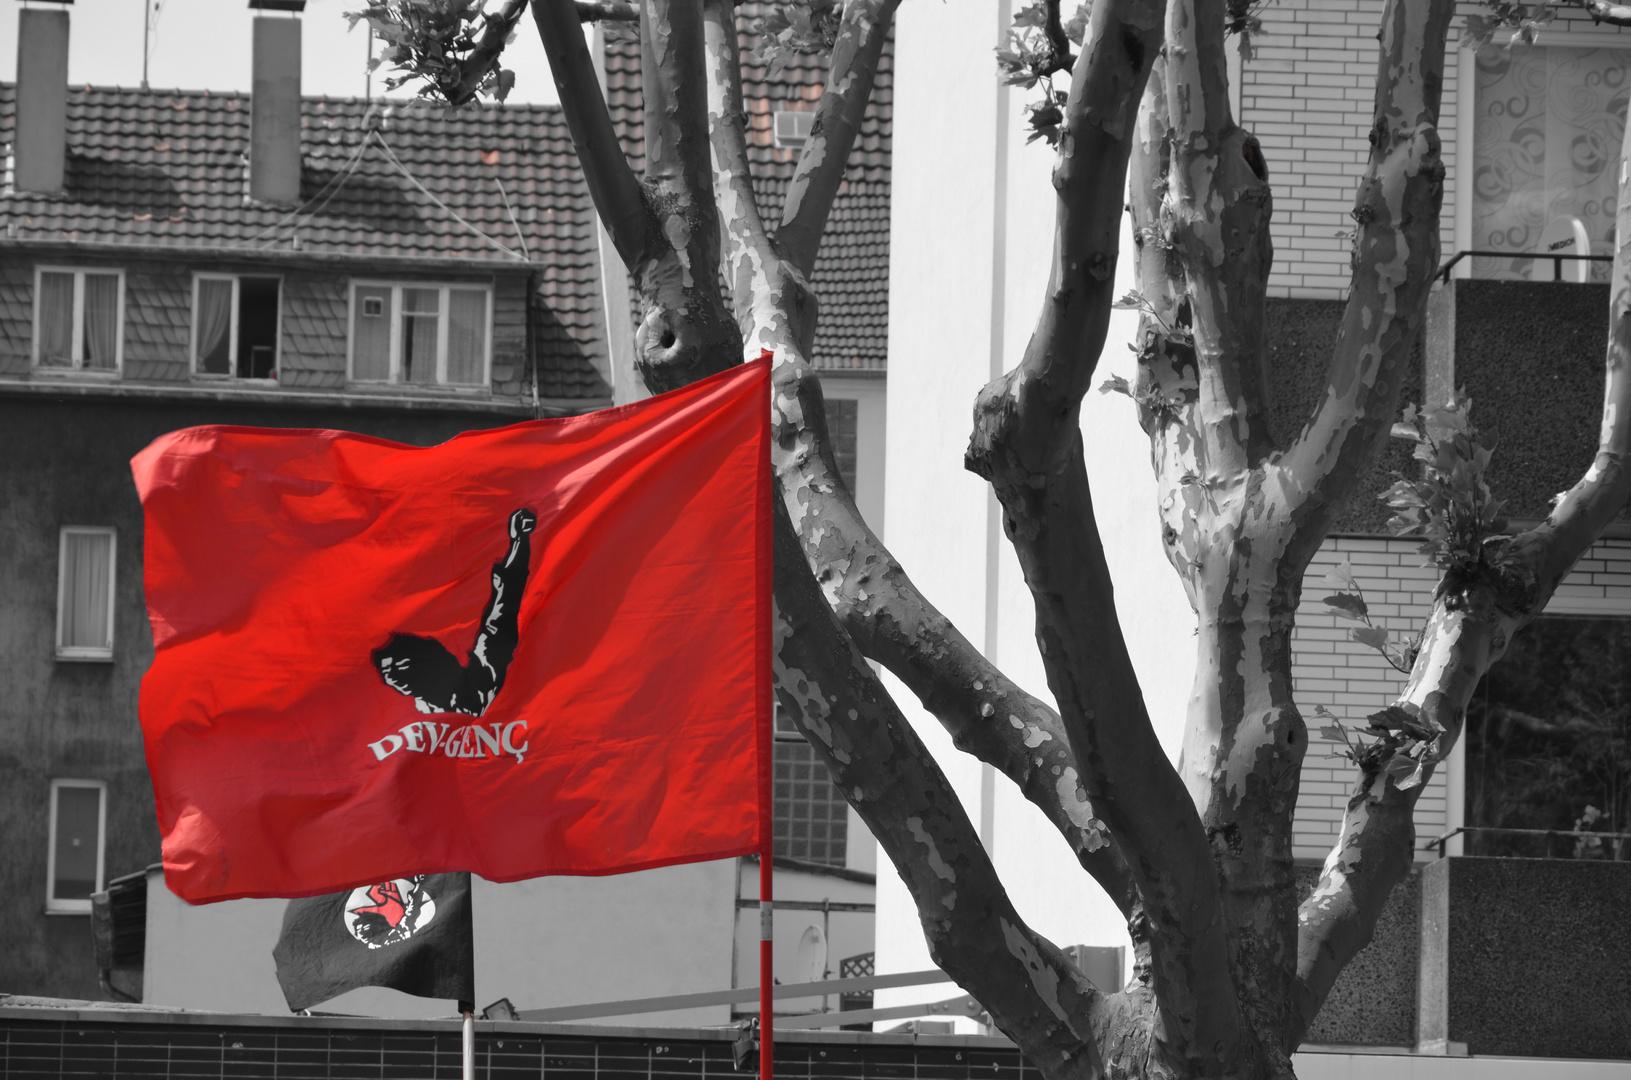 DEV GENC Flage bei einer Demo in Oberhausen